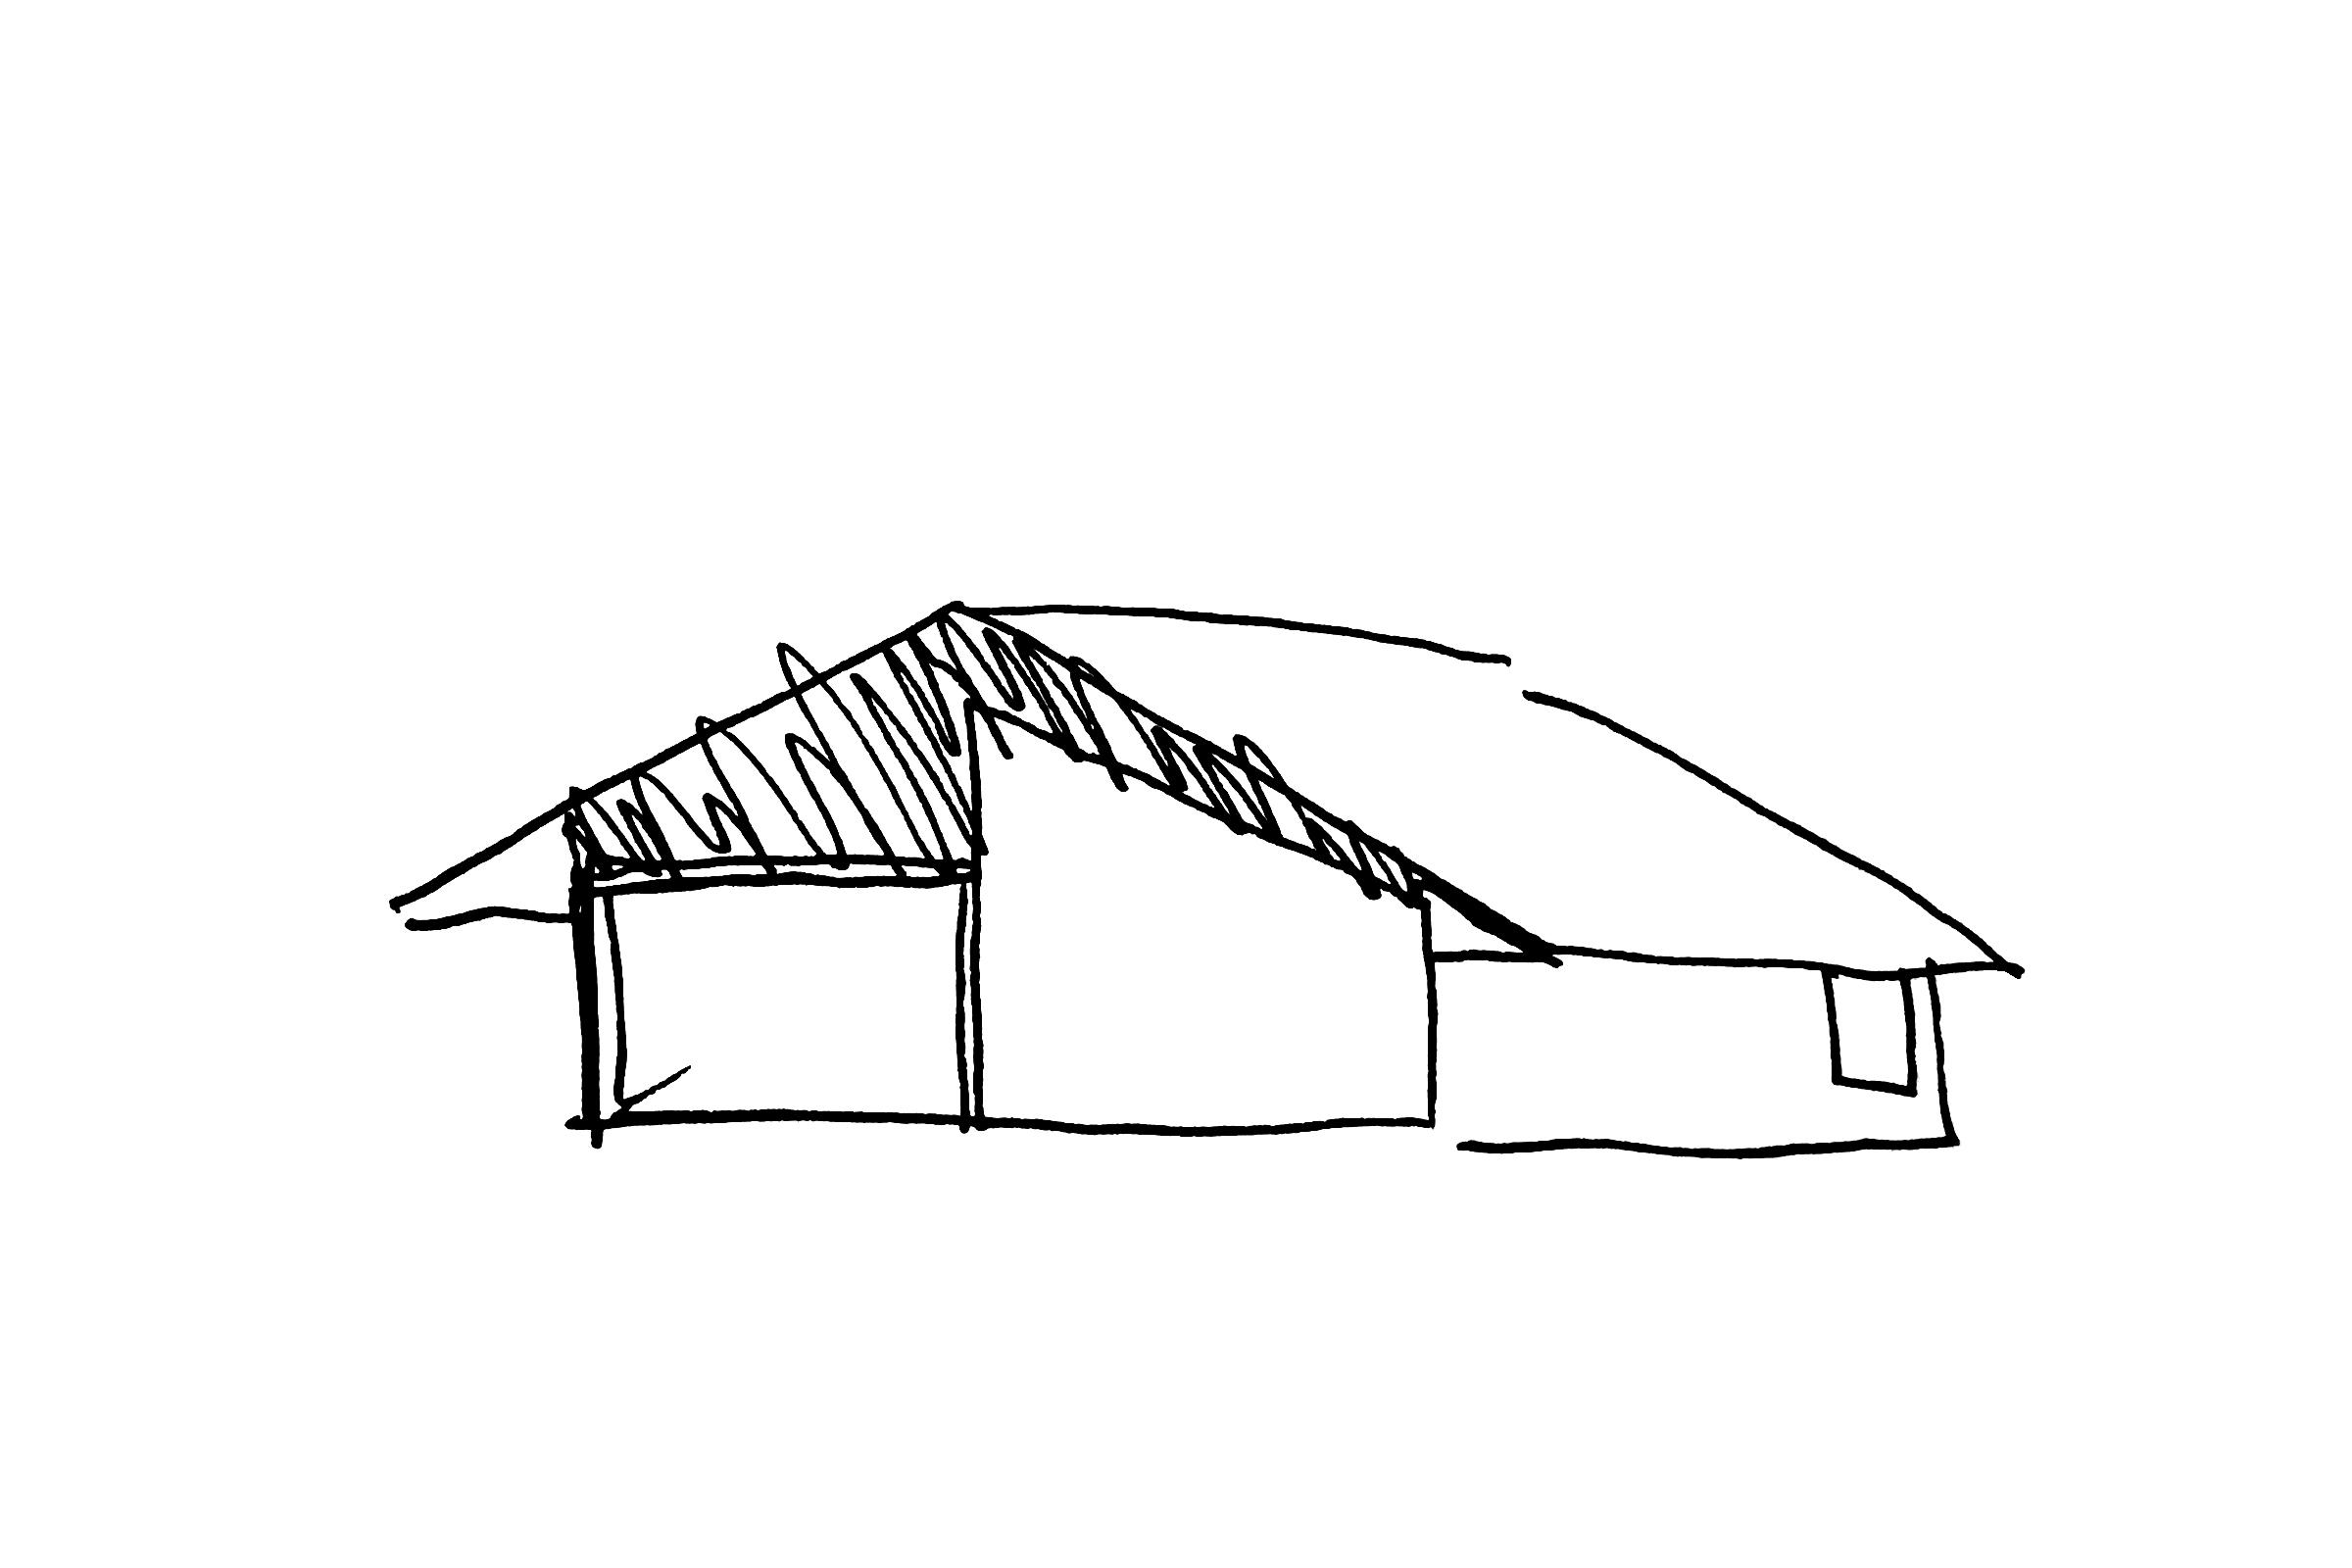 Novak House. Sketch of studio trusses